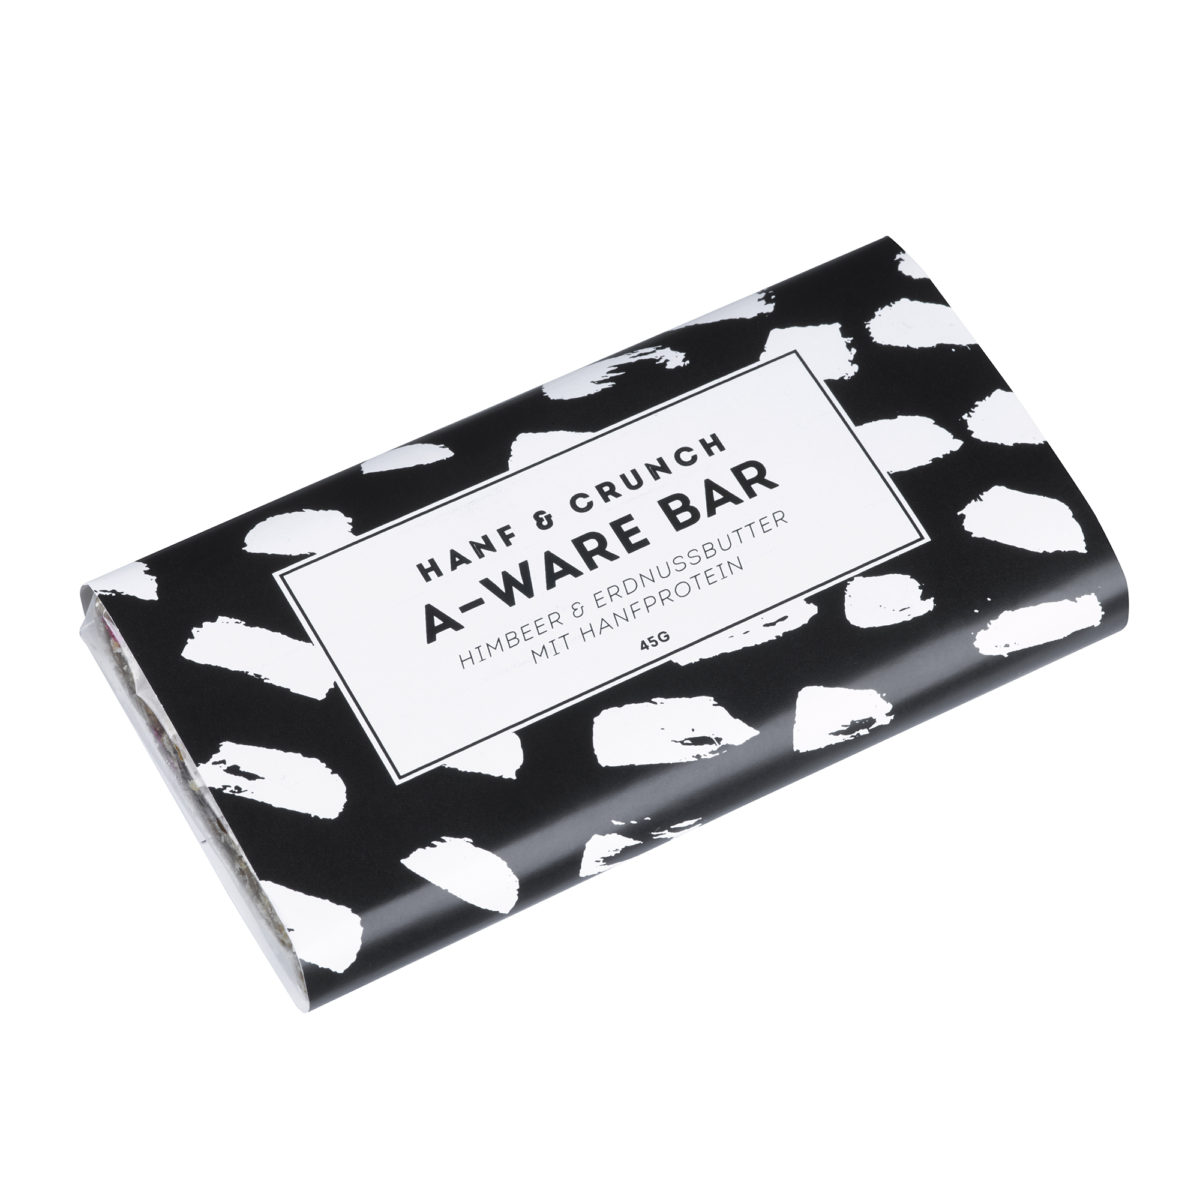 A-WARE Himbeer-Erdnussbutter Hanfproteinriegel